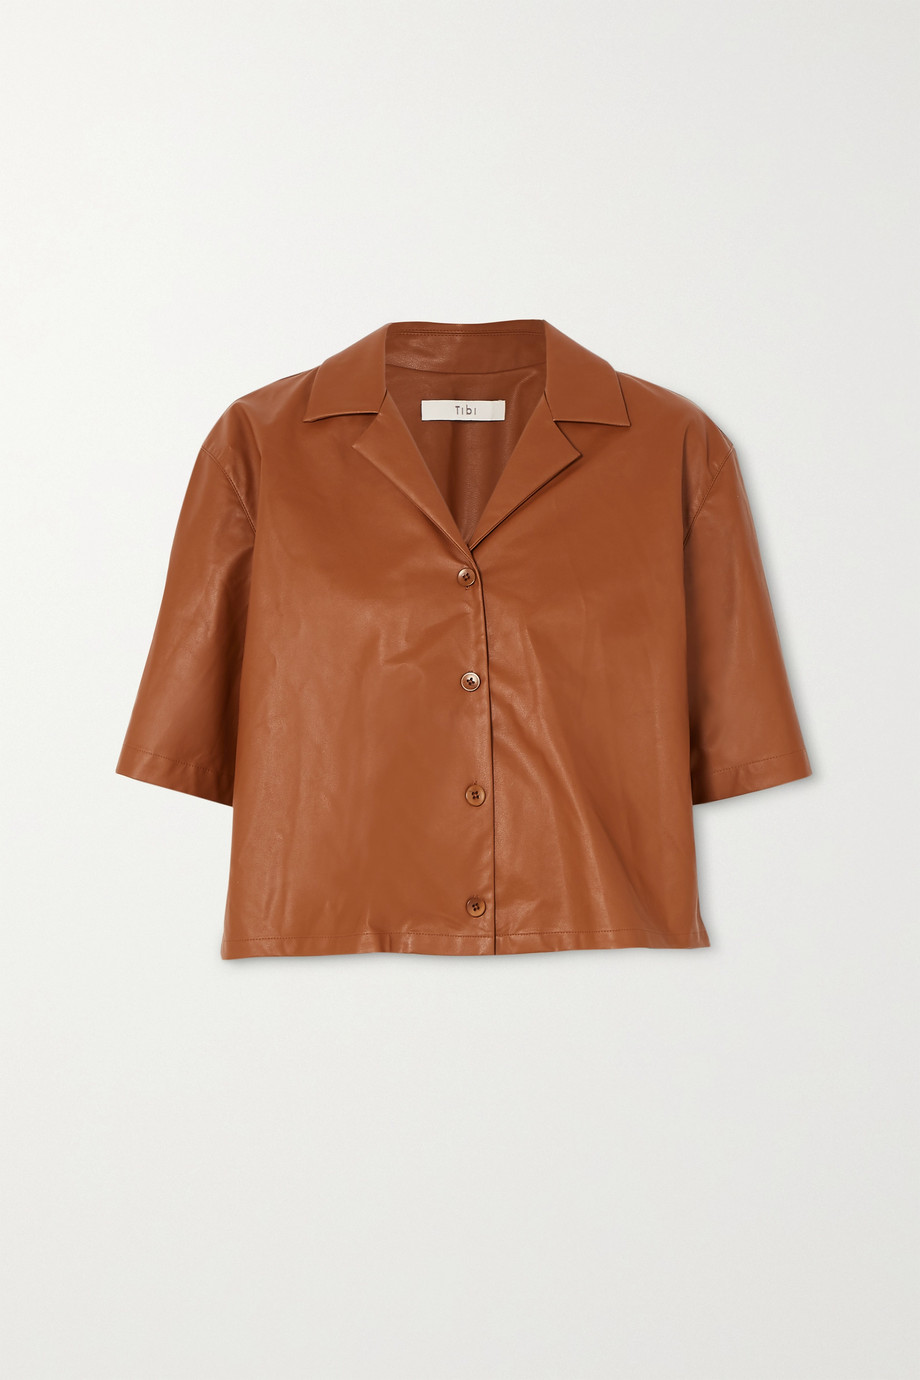 Tibi 人造皮革衬衫